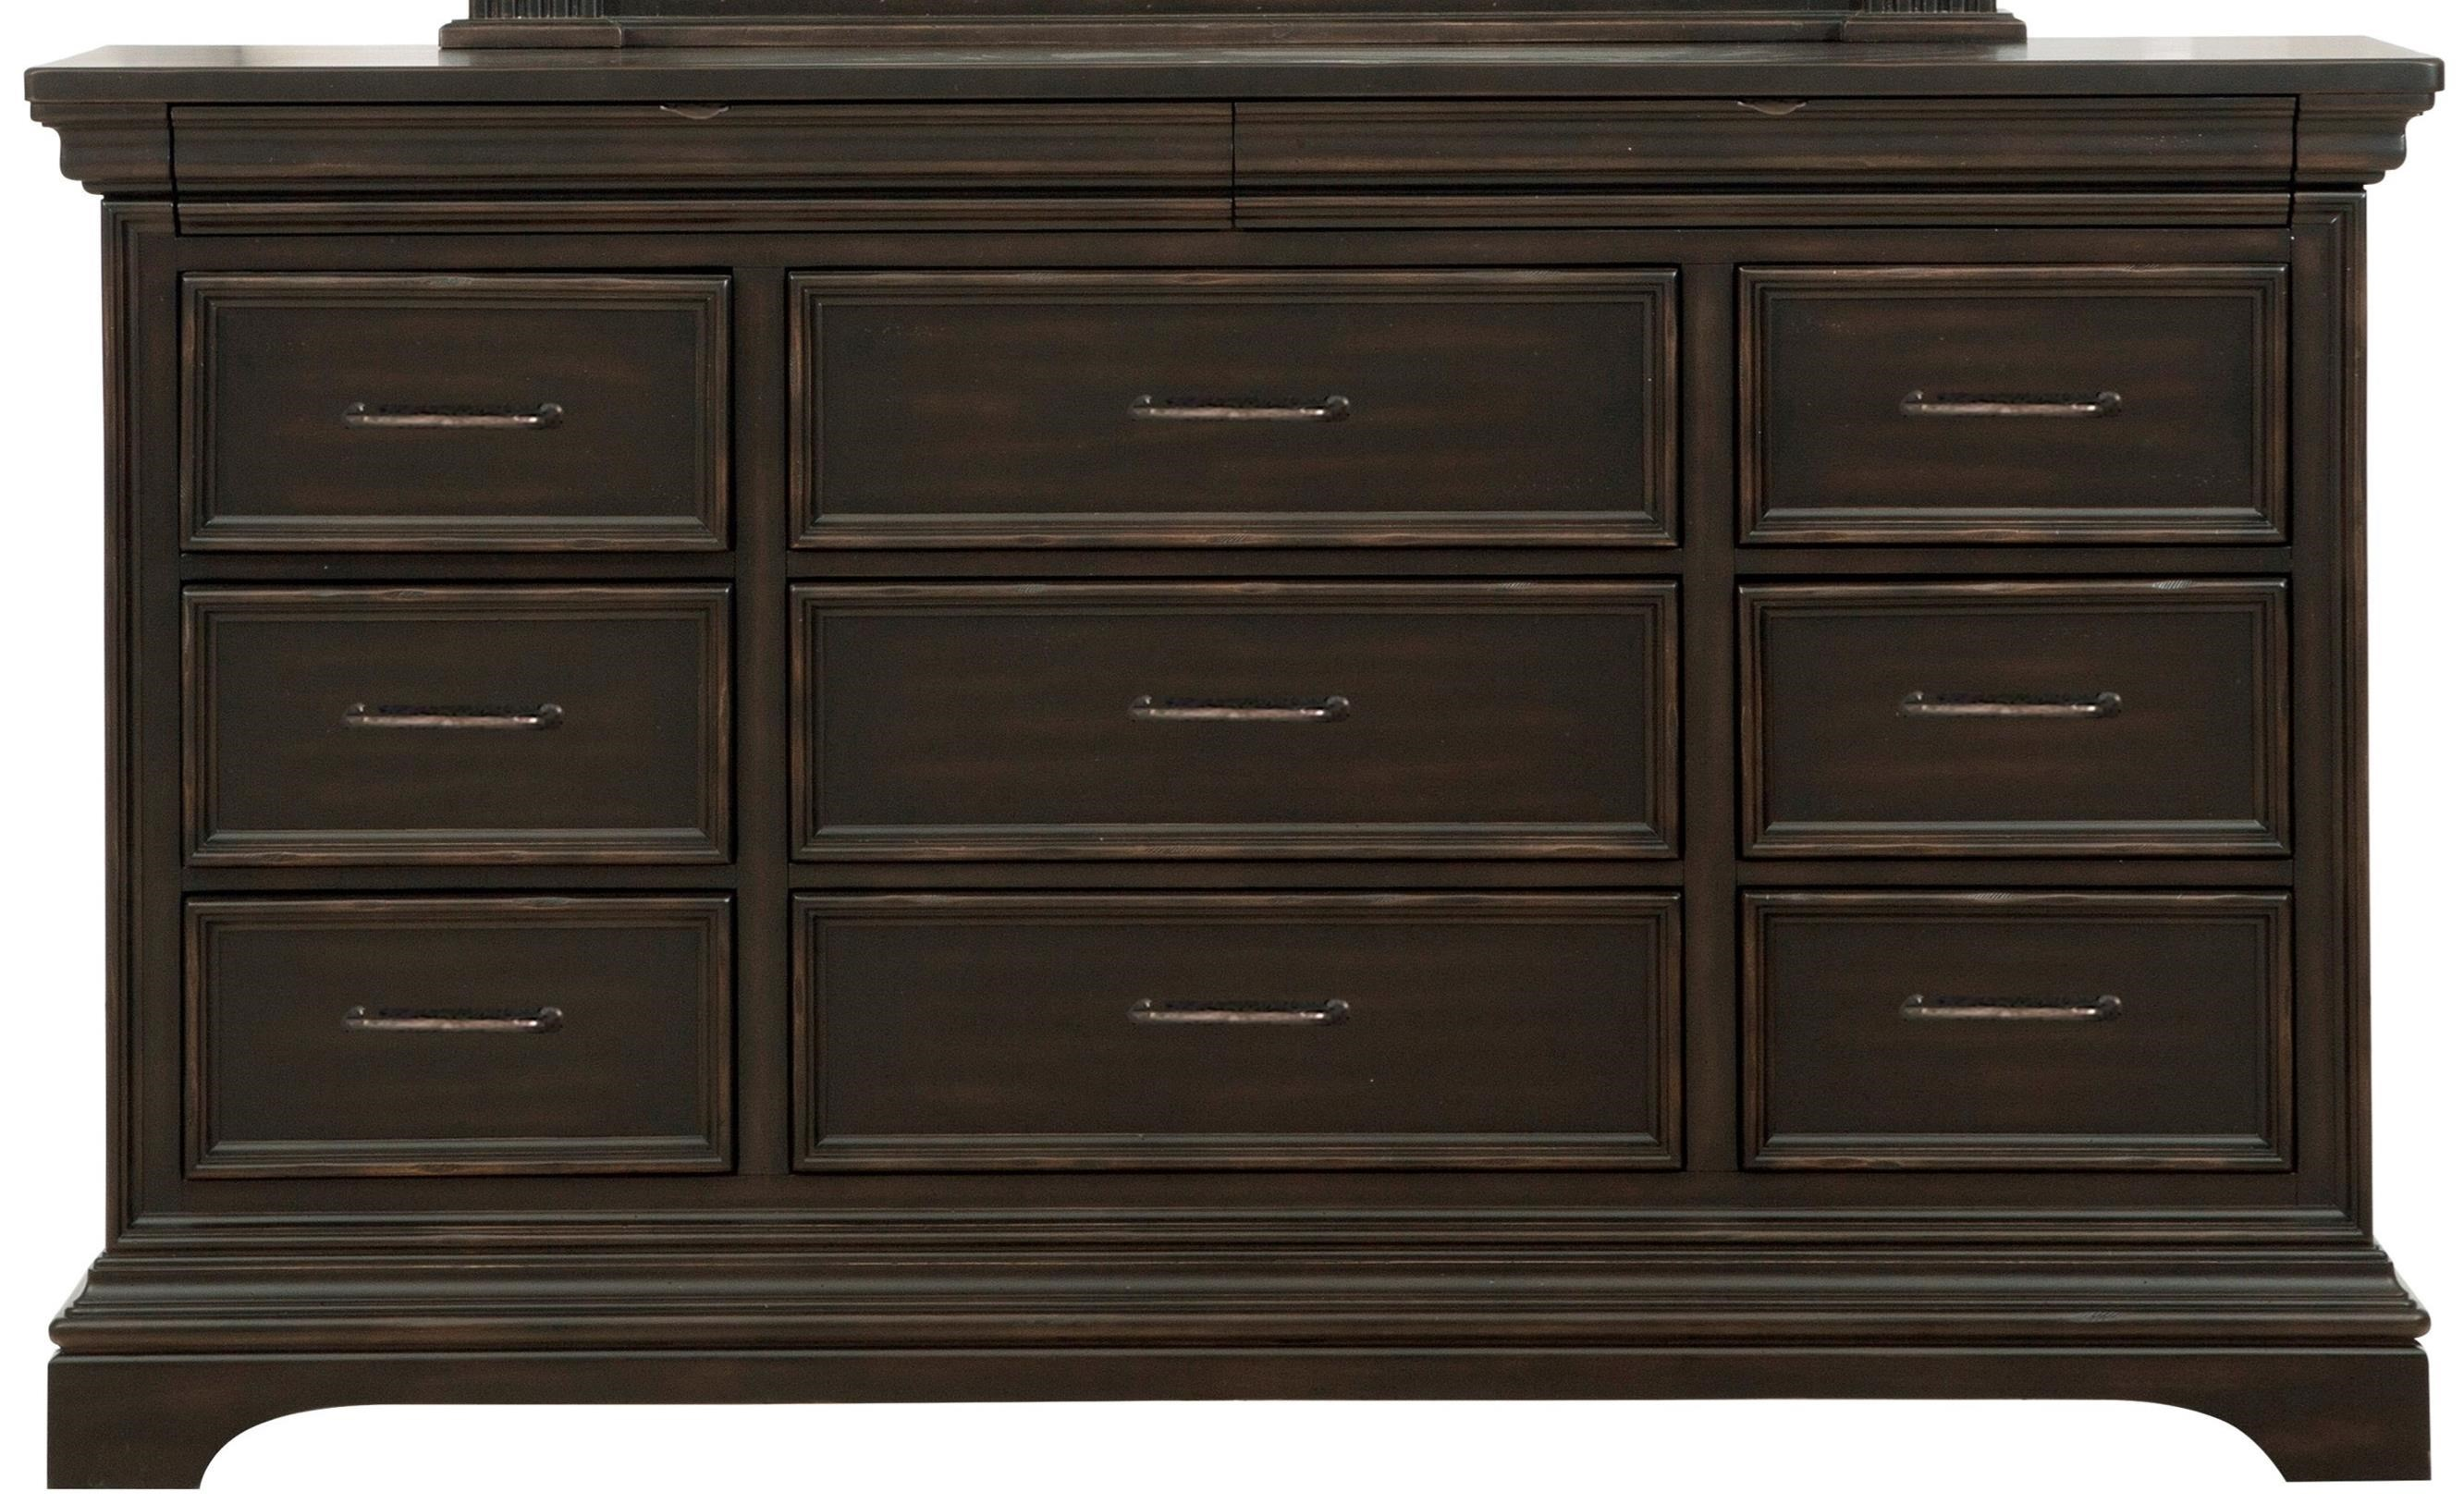 Pulaski Furniture Caldwell 11 Drawer Dresser With Jewelry Tray   Pedigo  Furniture   Dressers